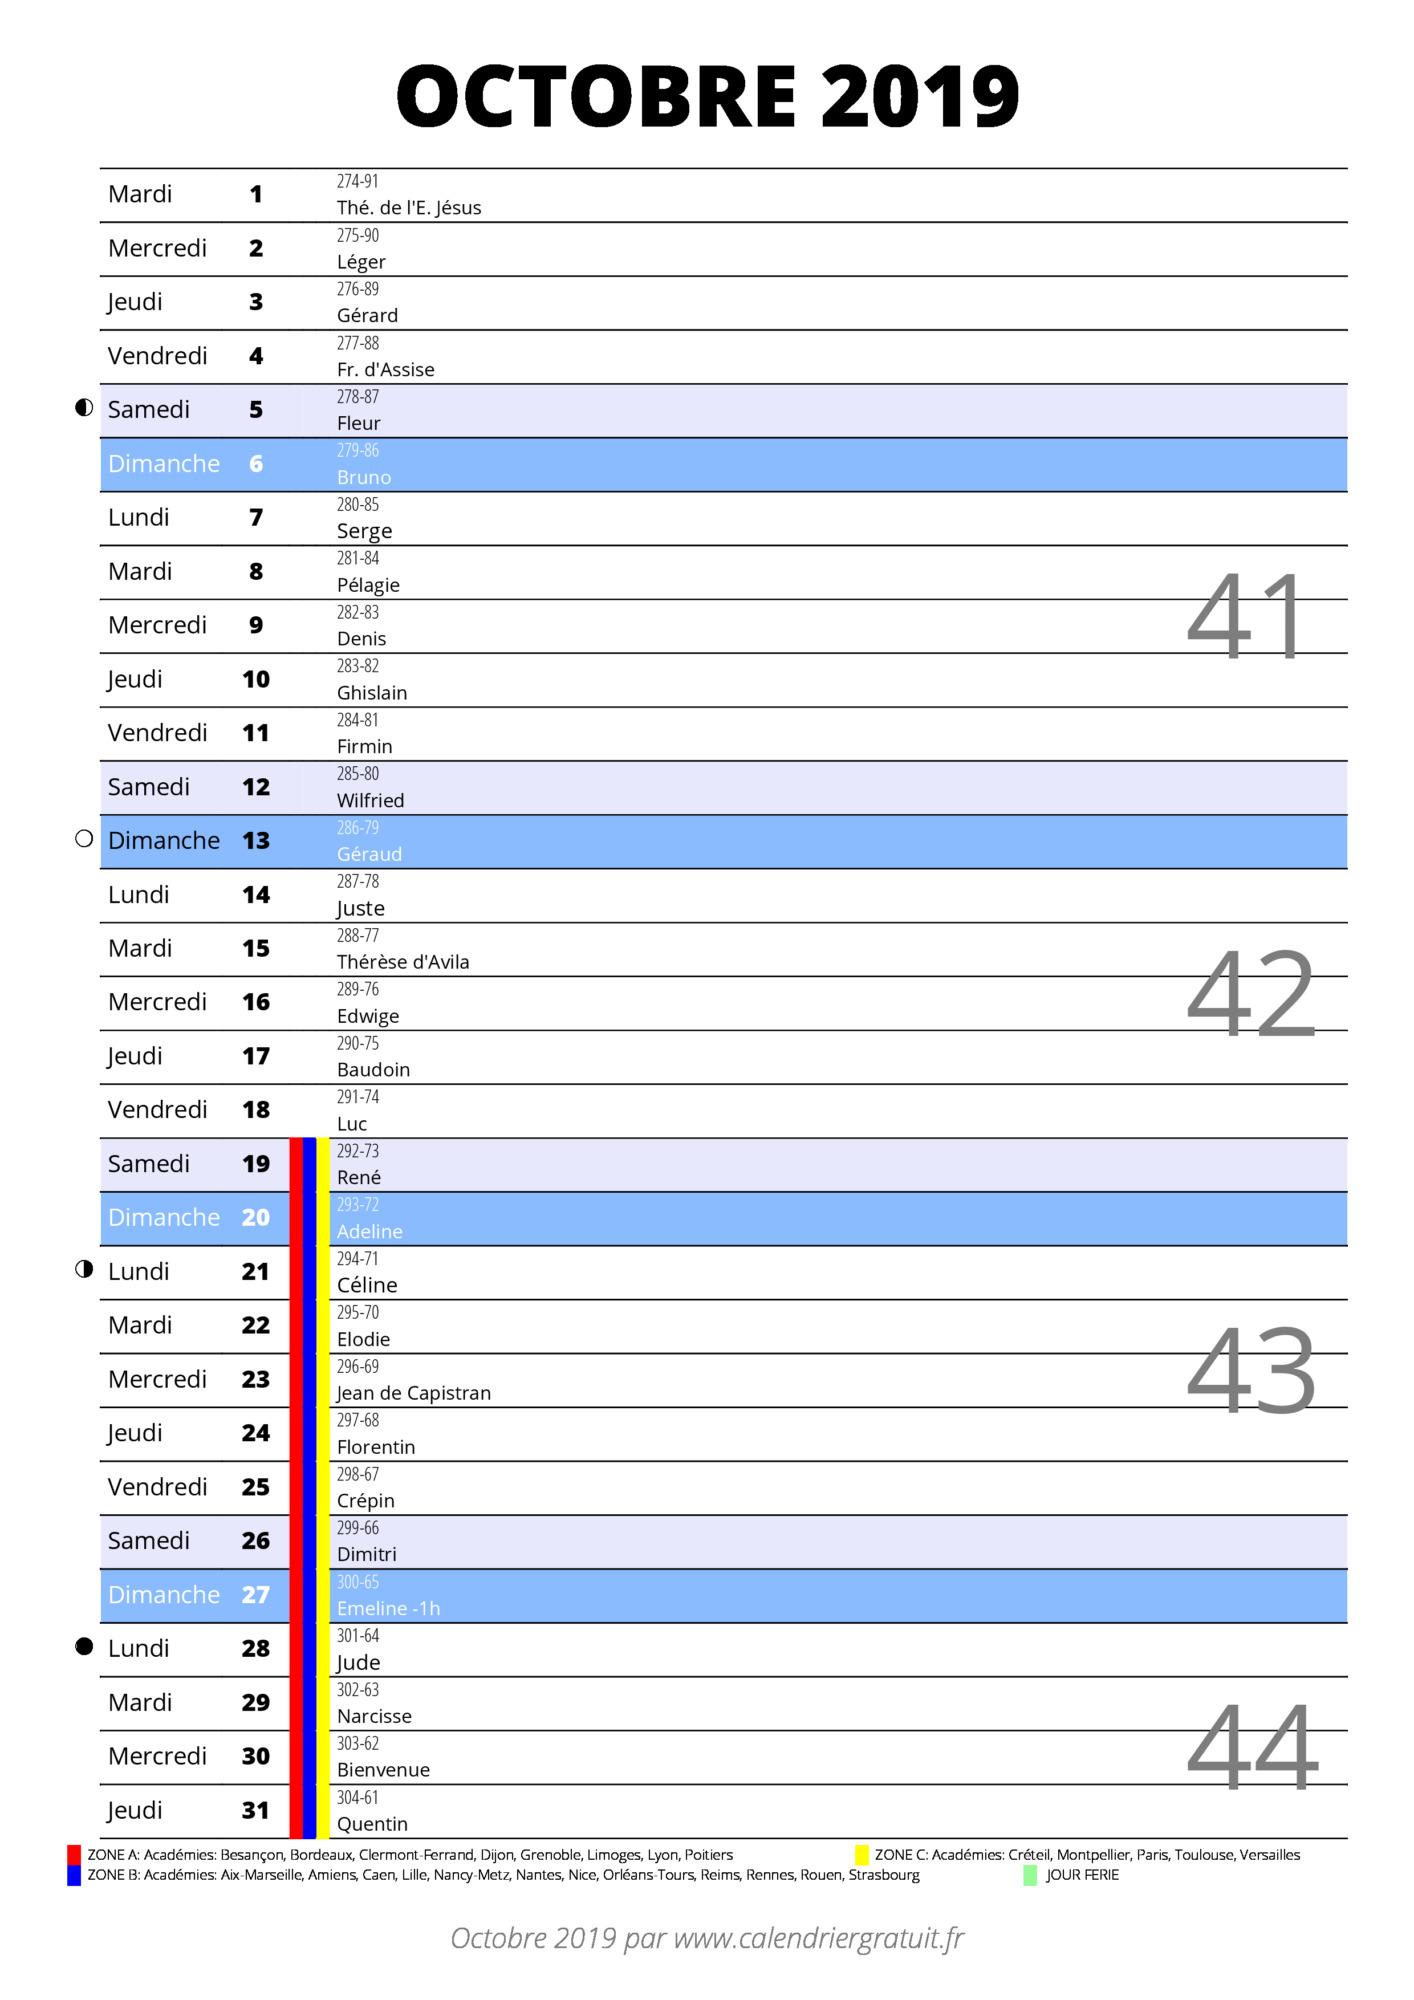 Calendrier 2019 Excel A Telecharger.Calendrier Octobre 2019 A Imprimer